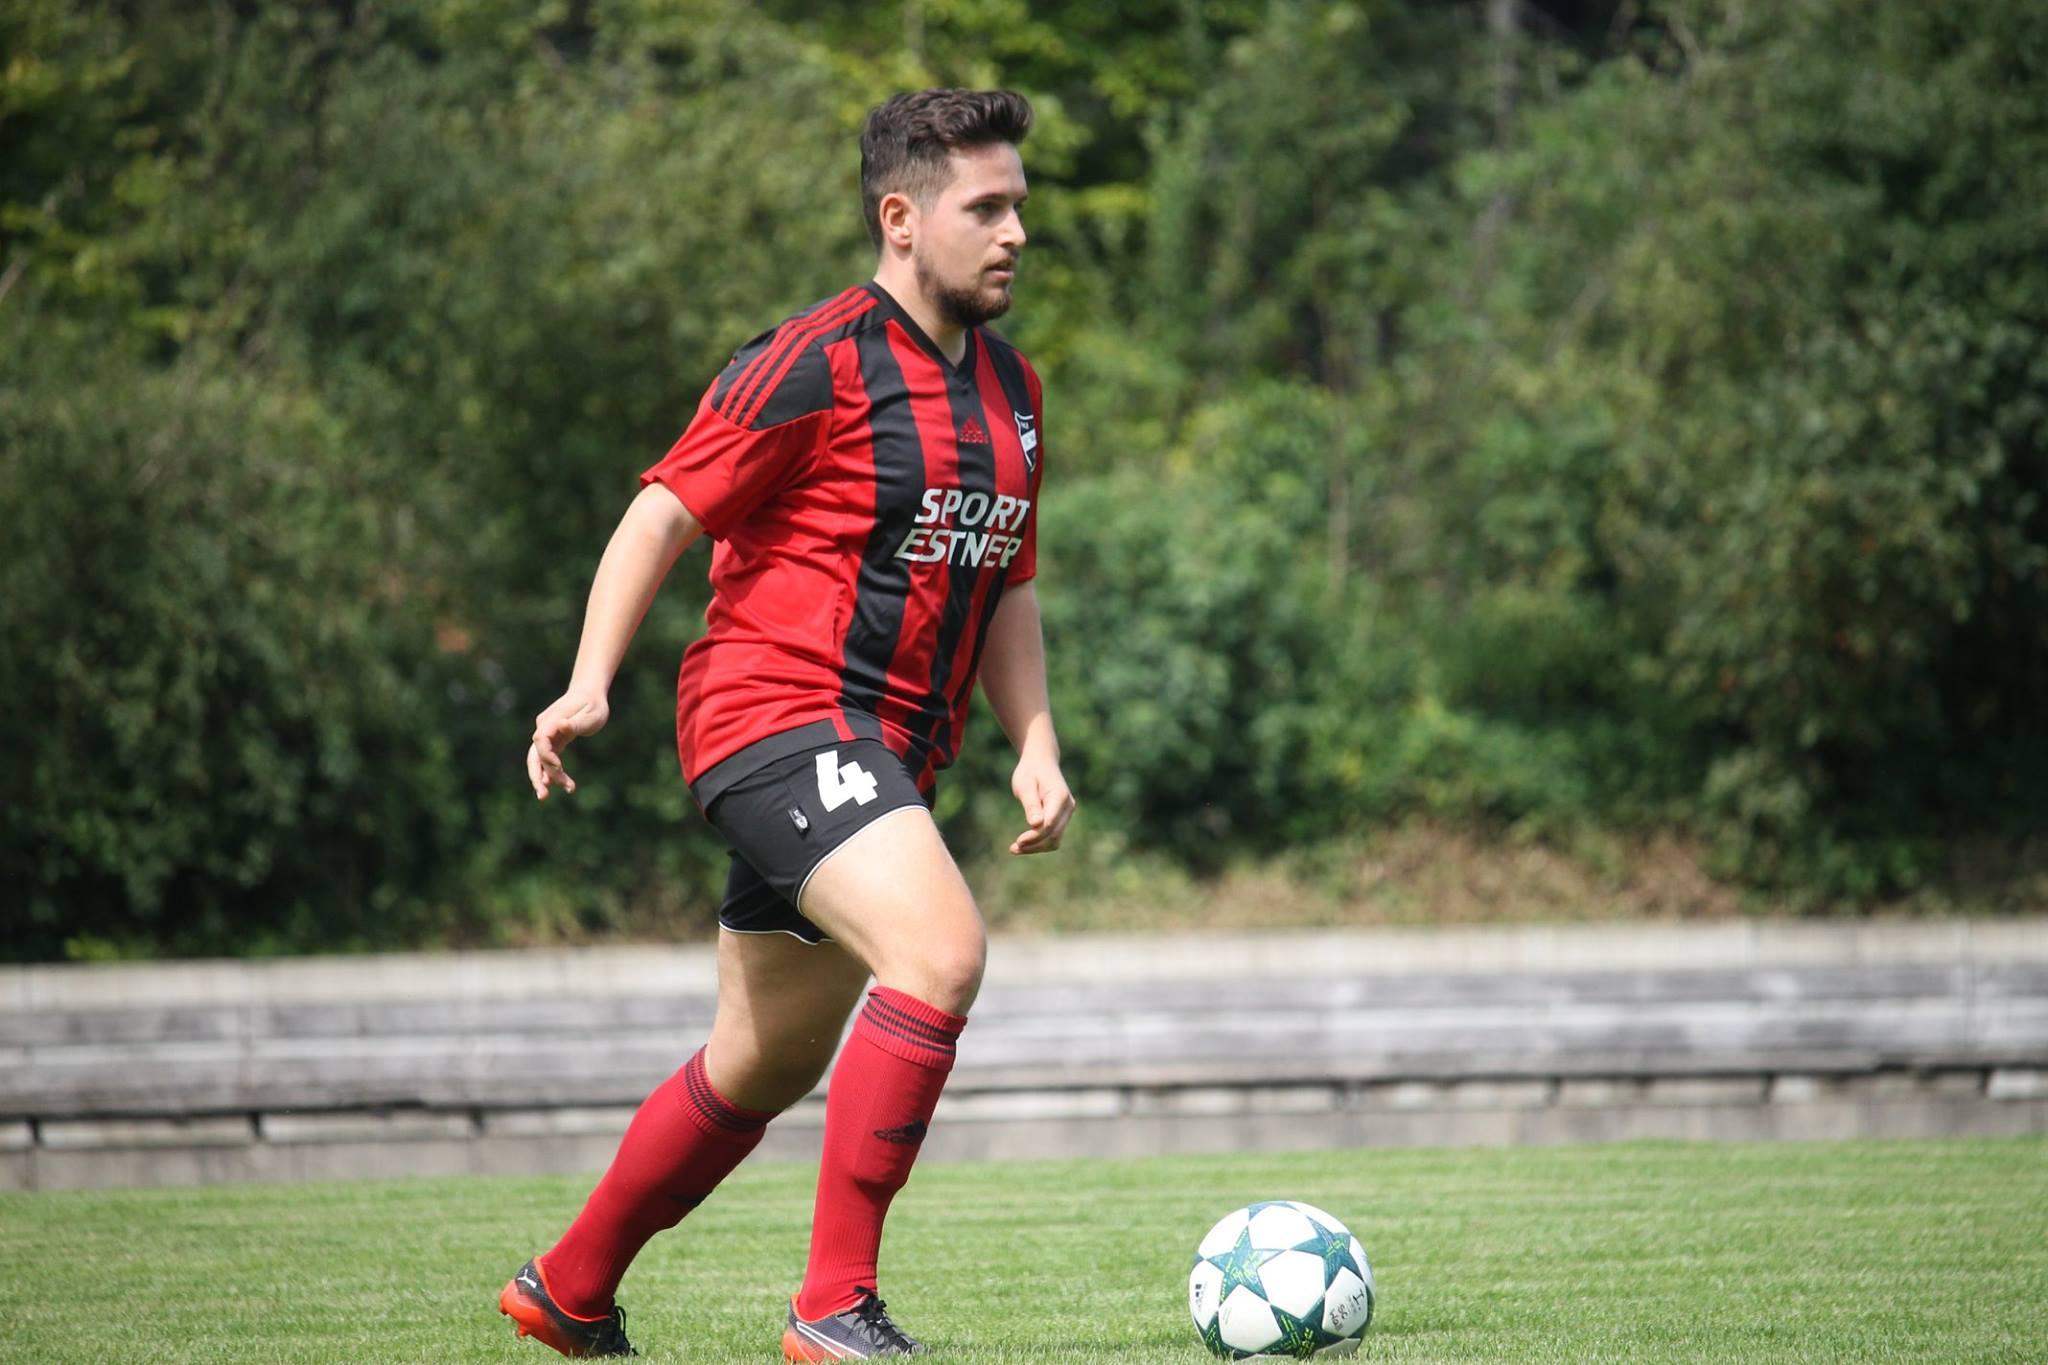 Gegen FC Hausham 07 (6:1) am 15.08.2017